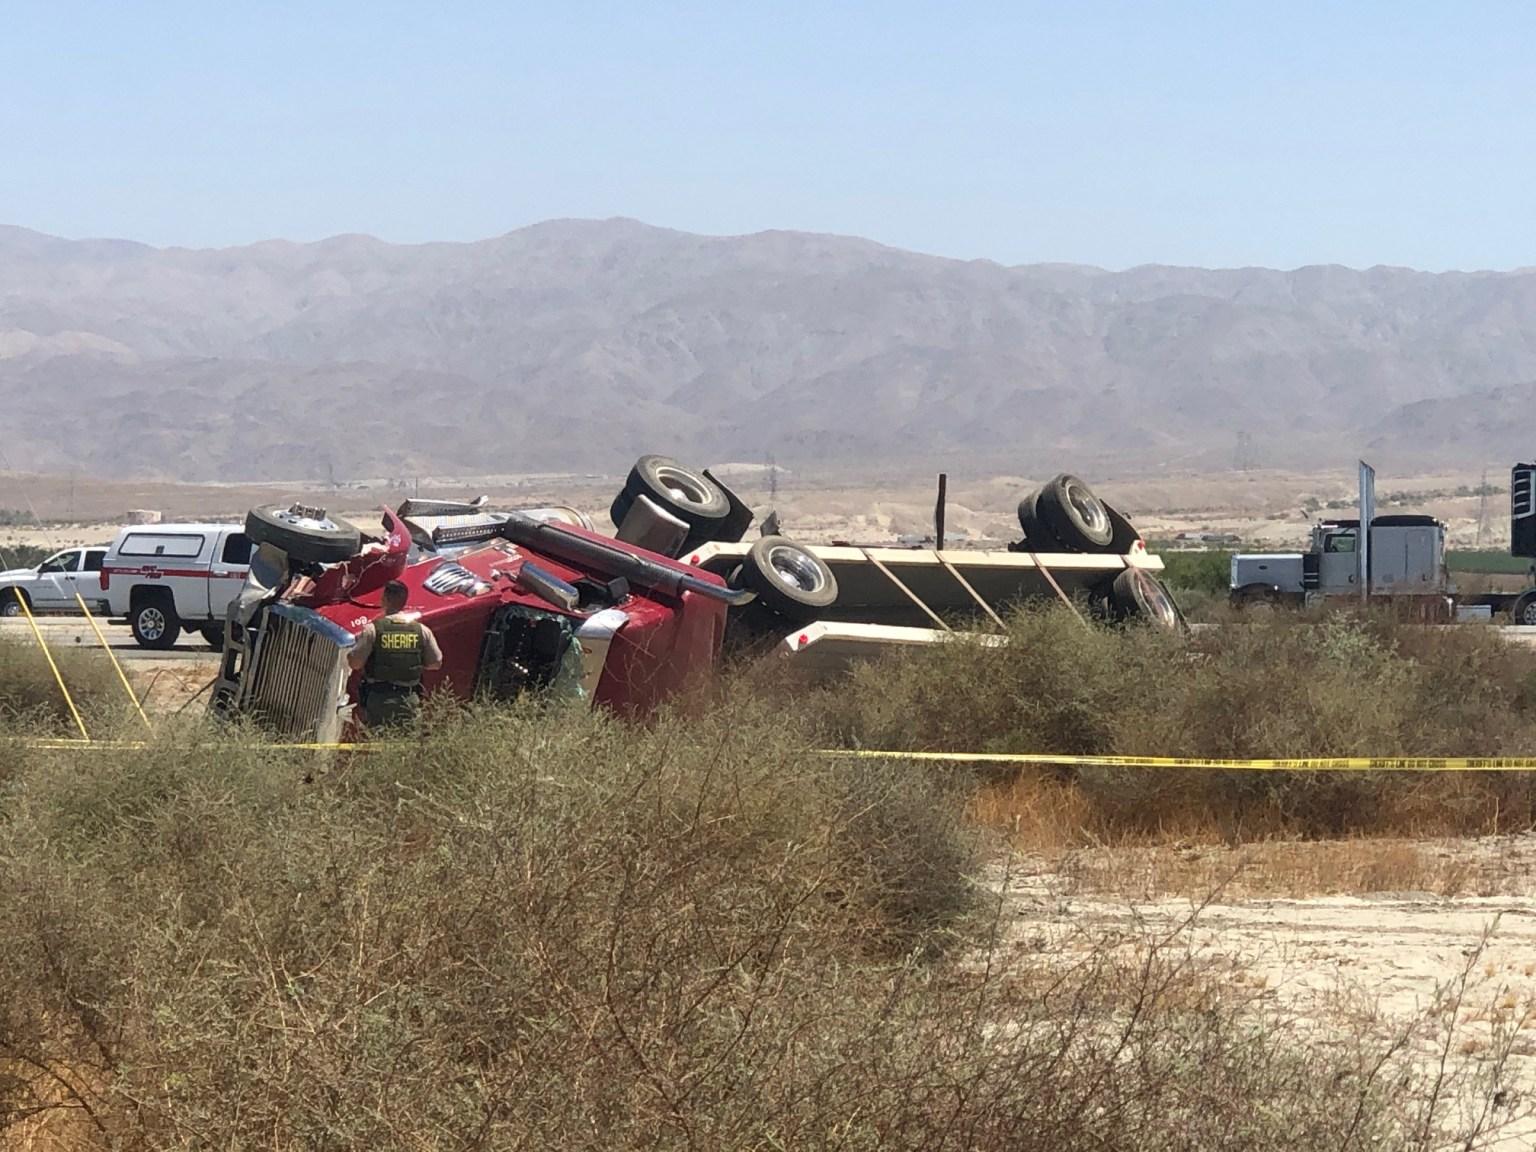 Two people dead following traffic collision on SR86